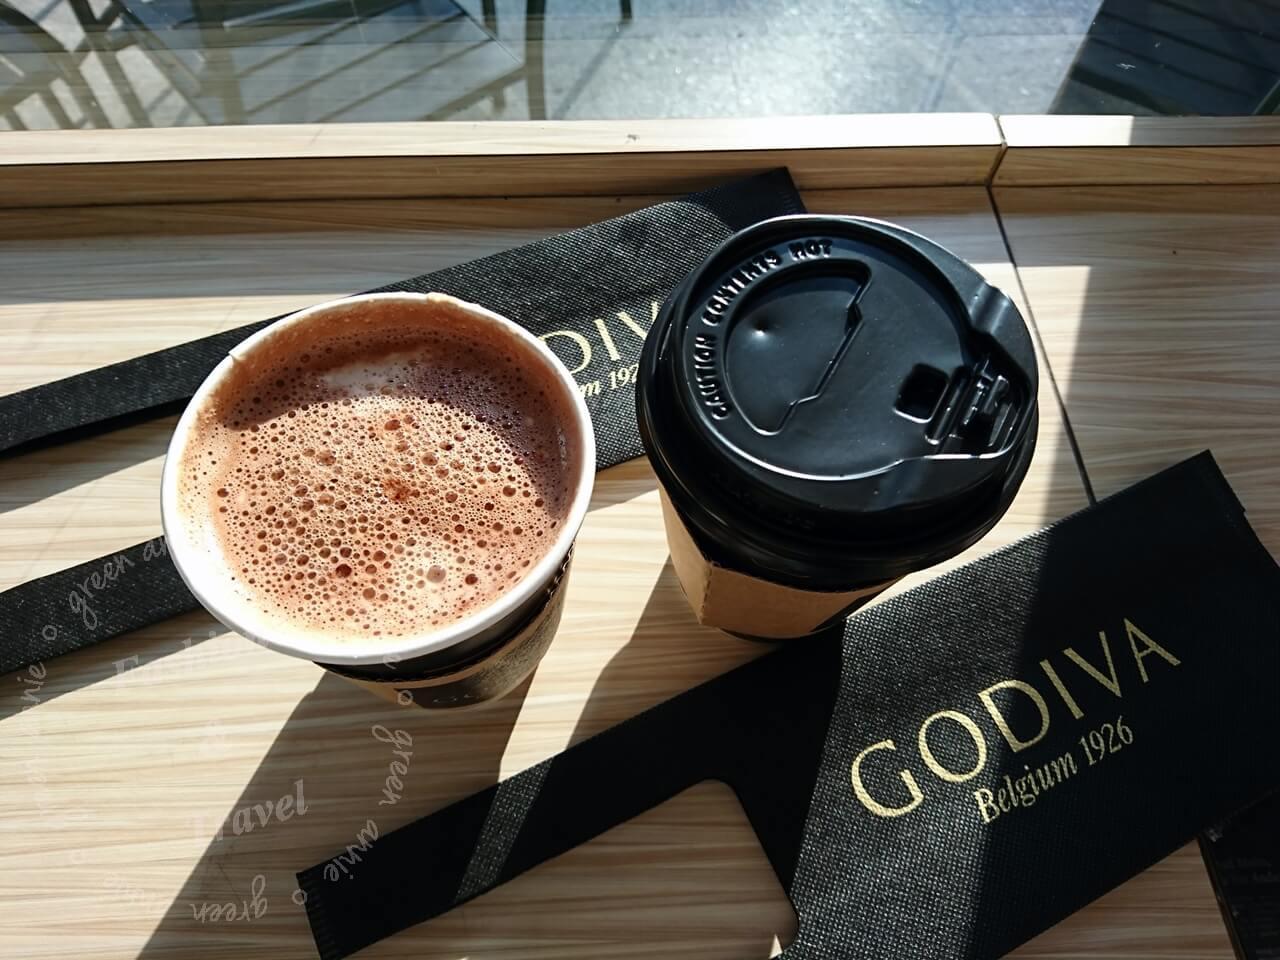 「GODIVA醇黑熱巧克力」7-ELEVEN12/5限量開賣